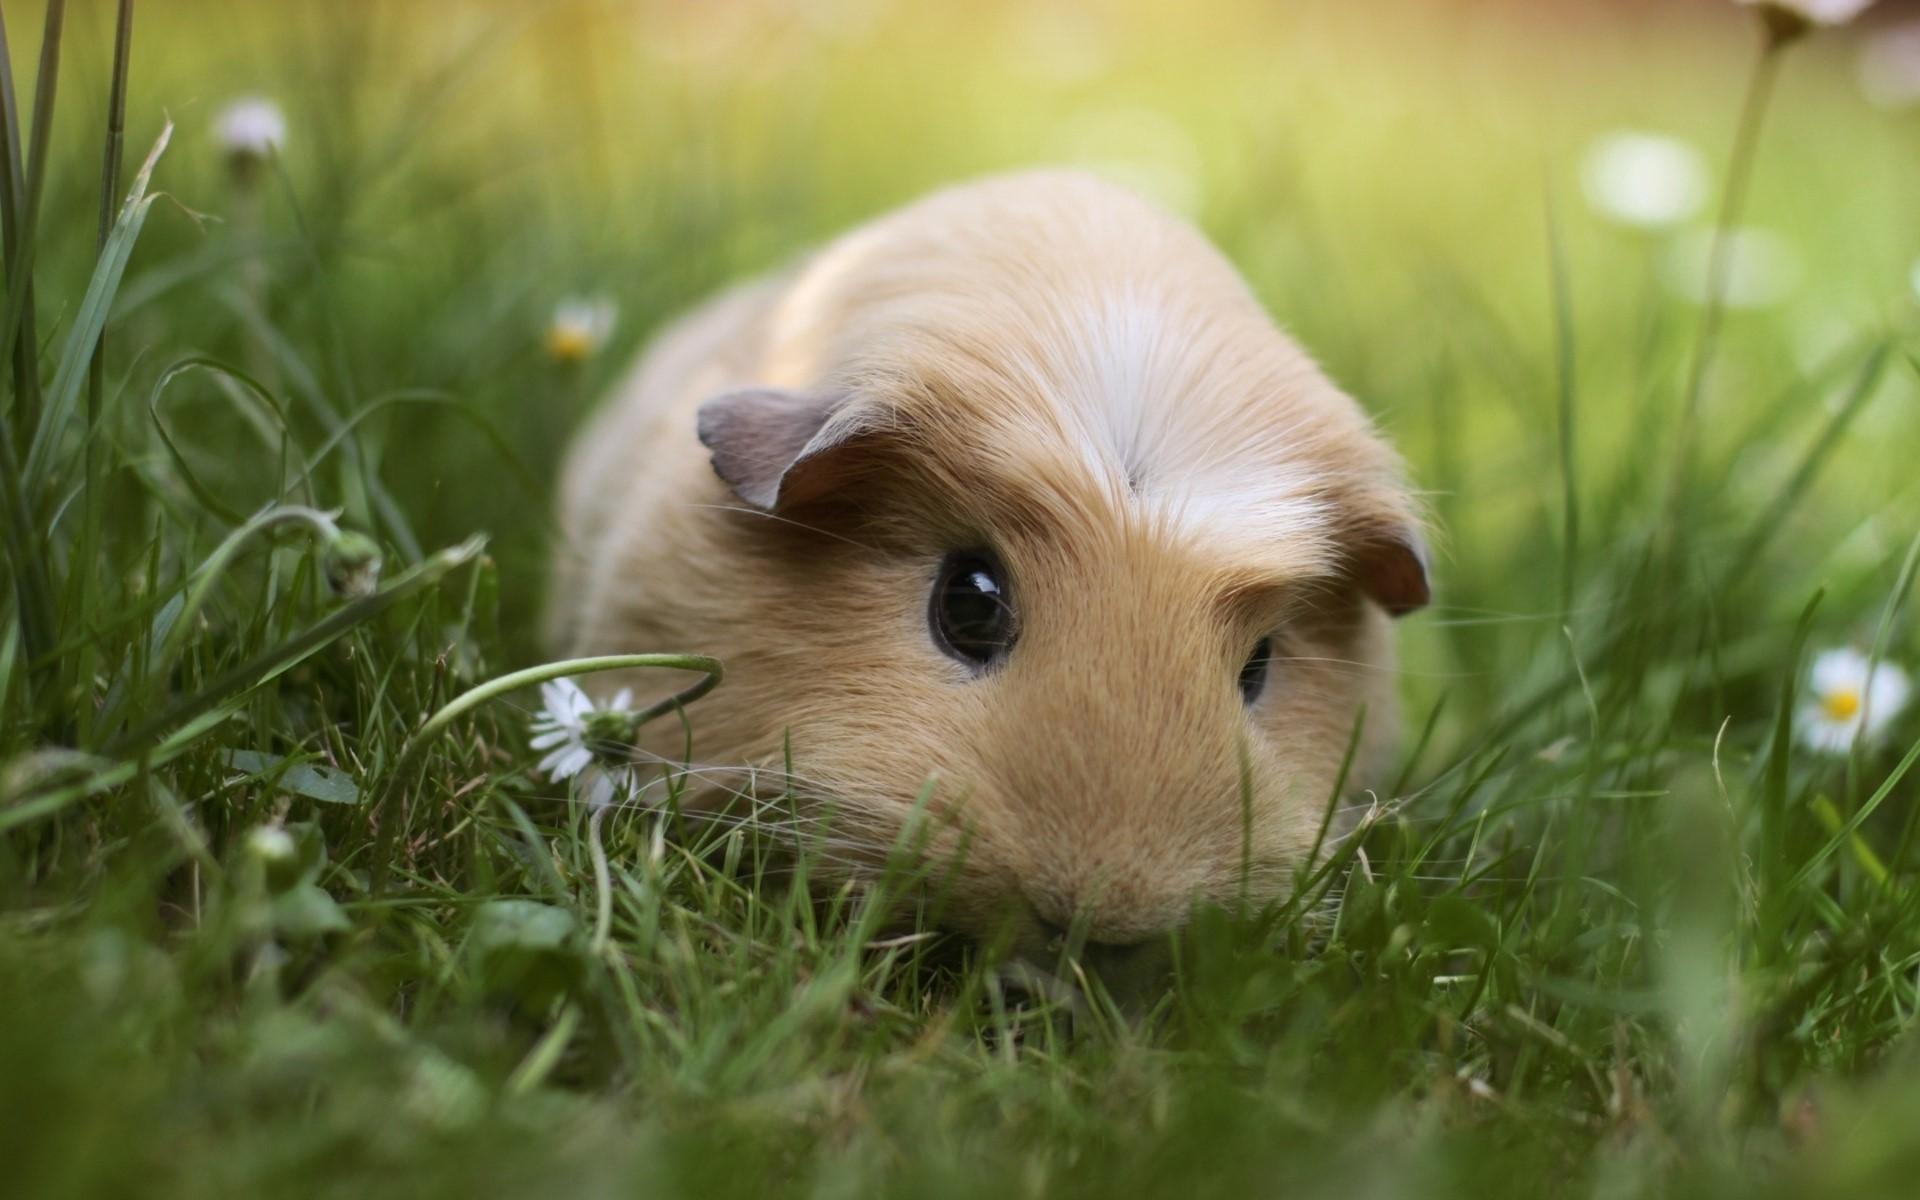 Guinea Pig images